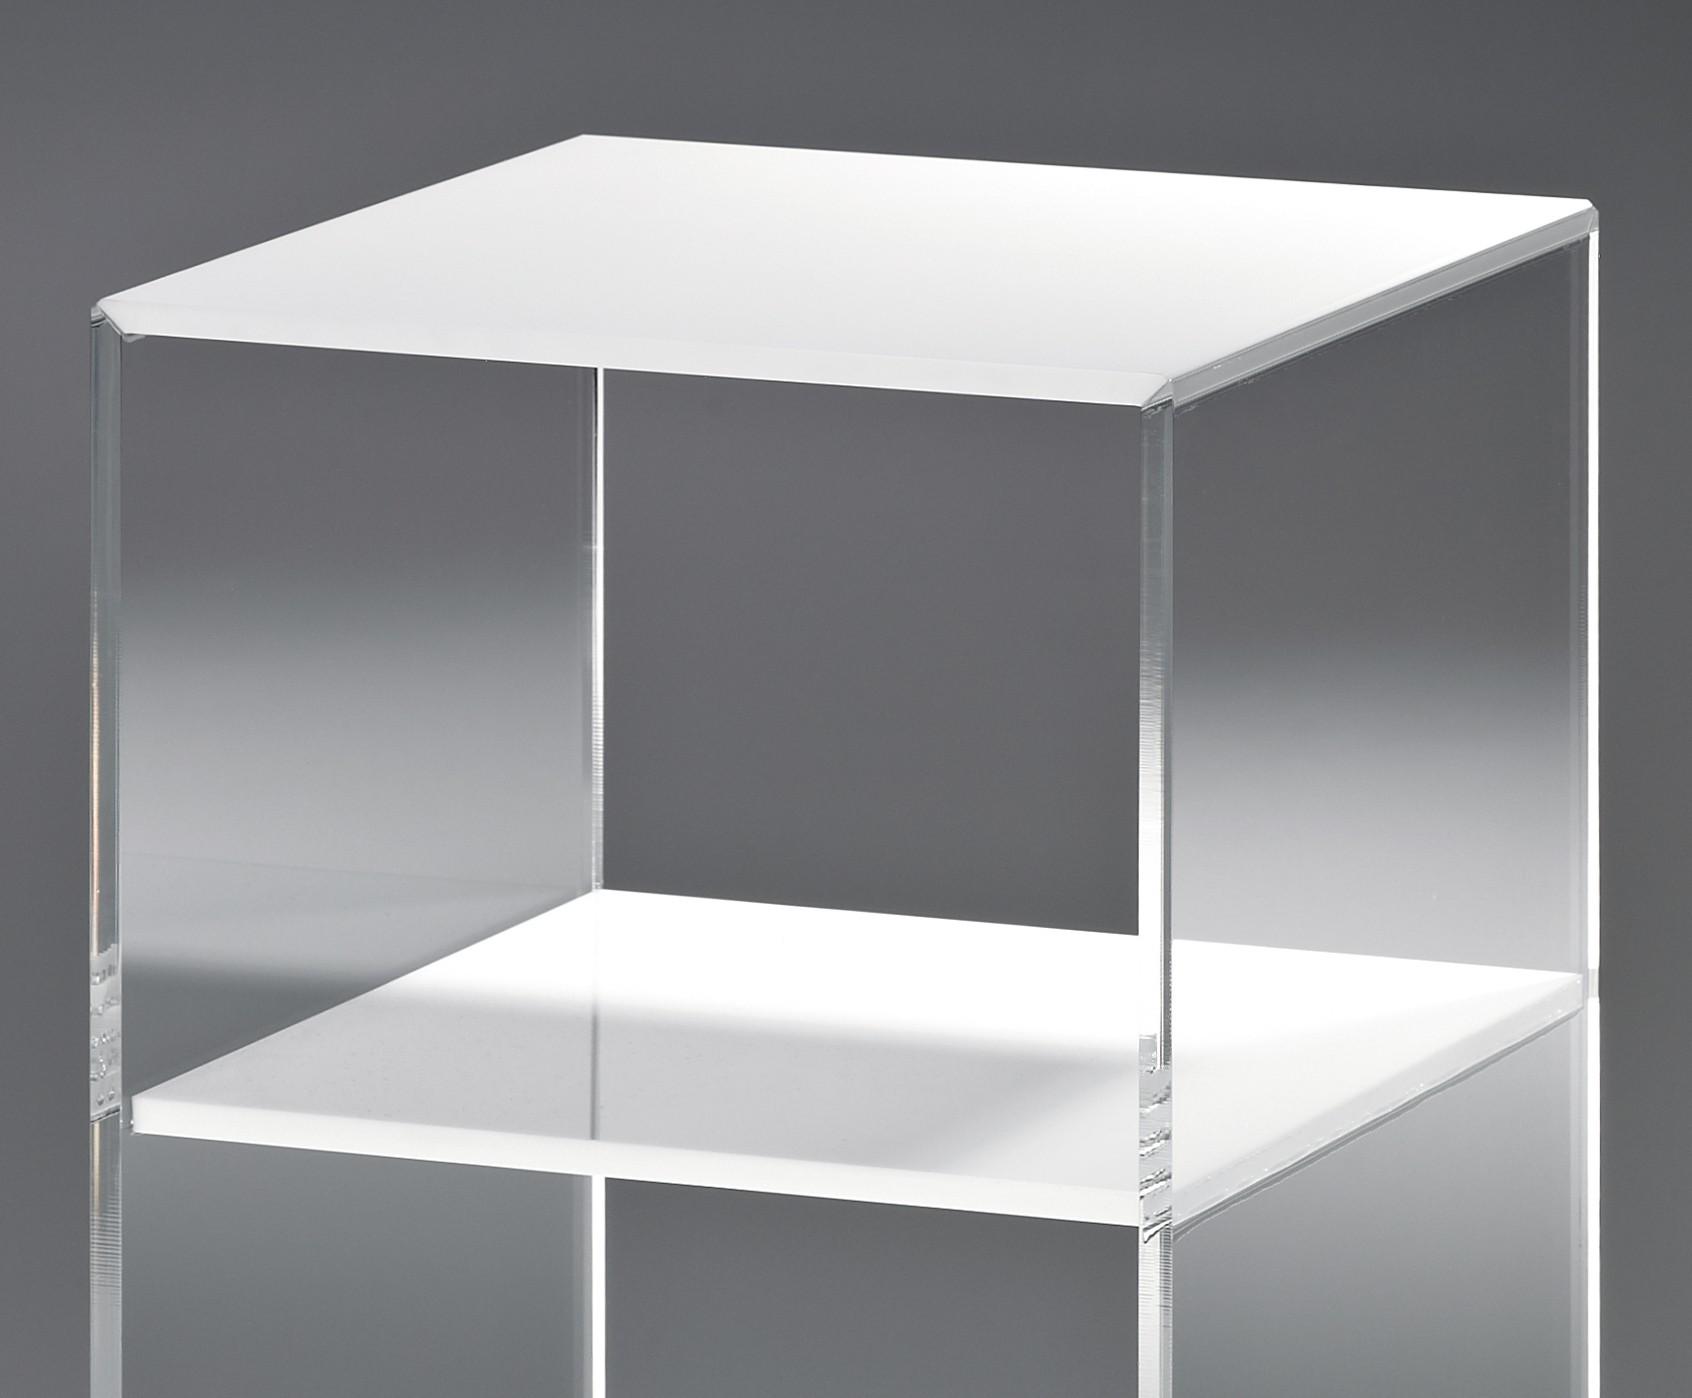 nachttisch las vegas f r boxspringbetten h he 73 cm. Black Bedroom Furniture Sets. Home Design Ideas